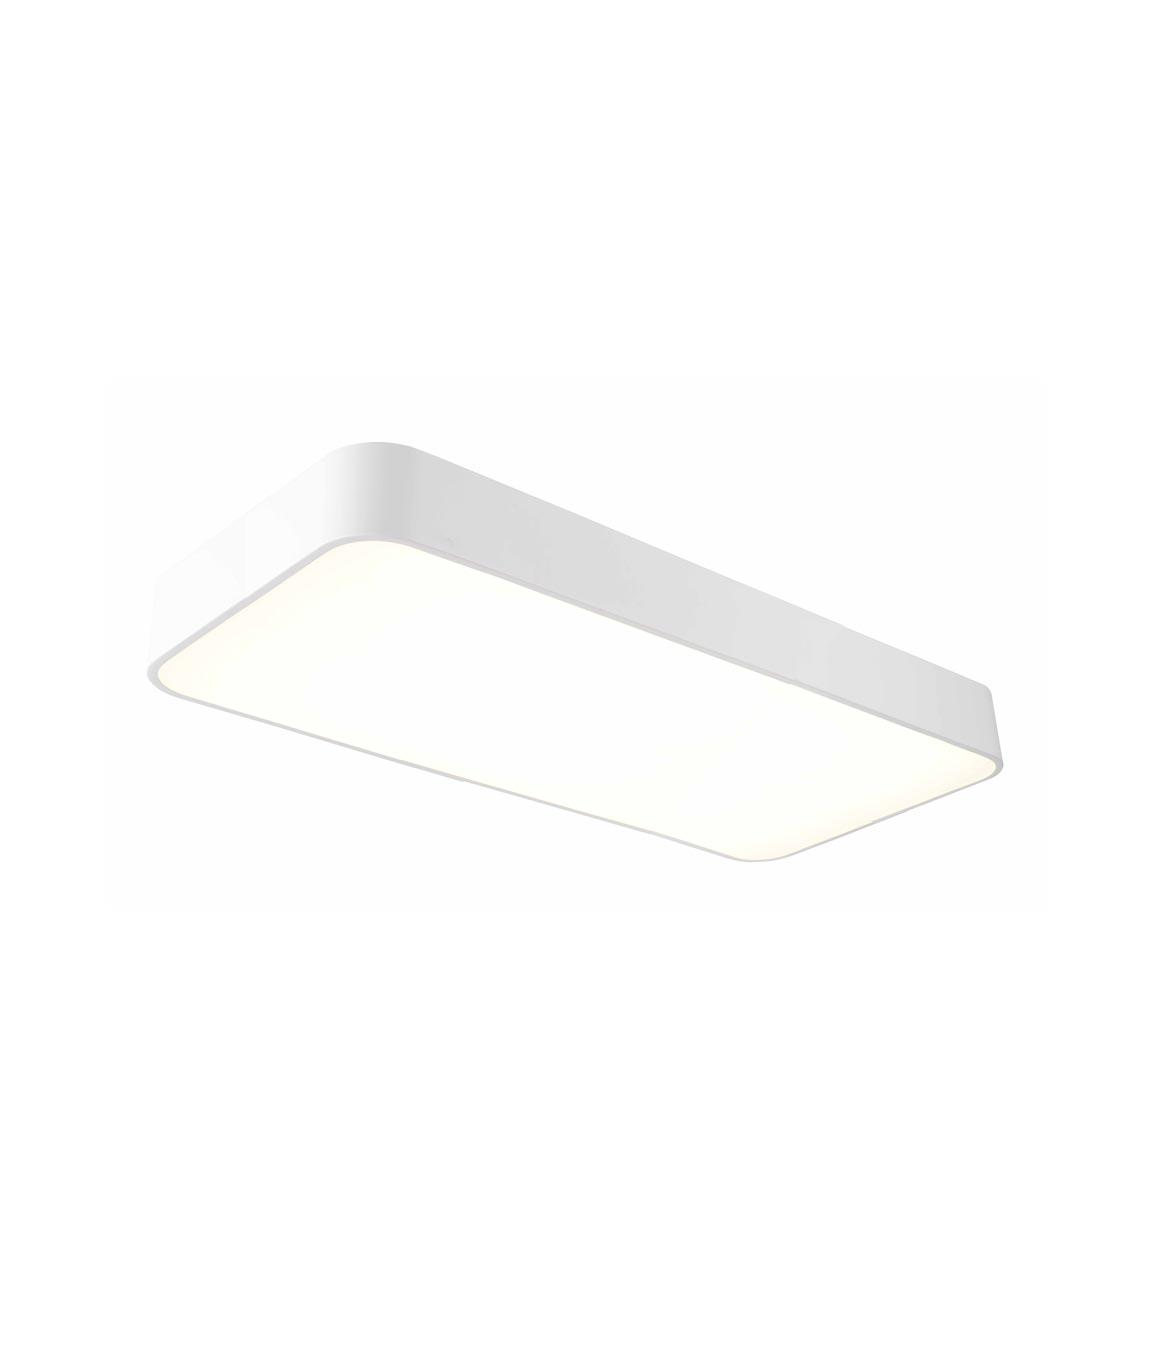 Plafón rectangular pequeño CUMBUCO blanco